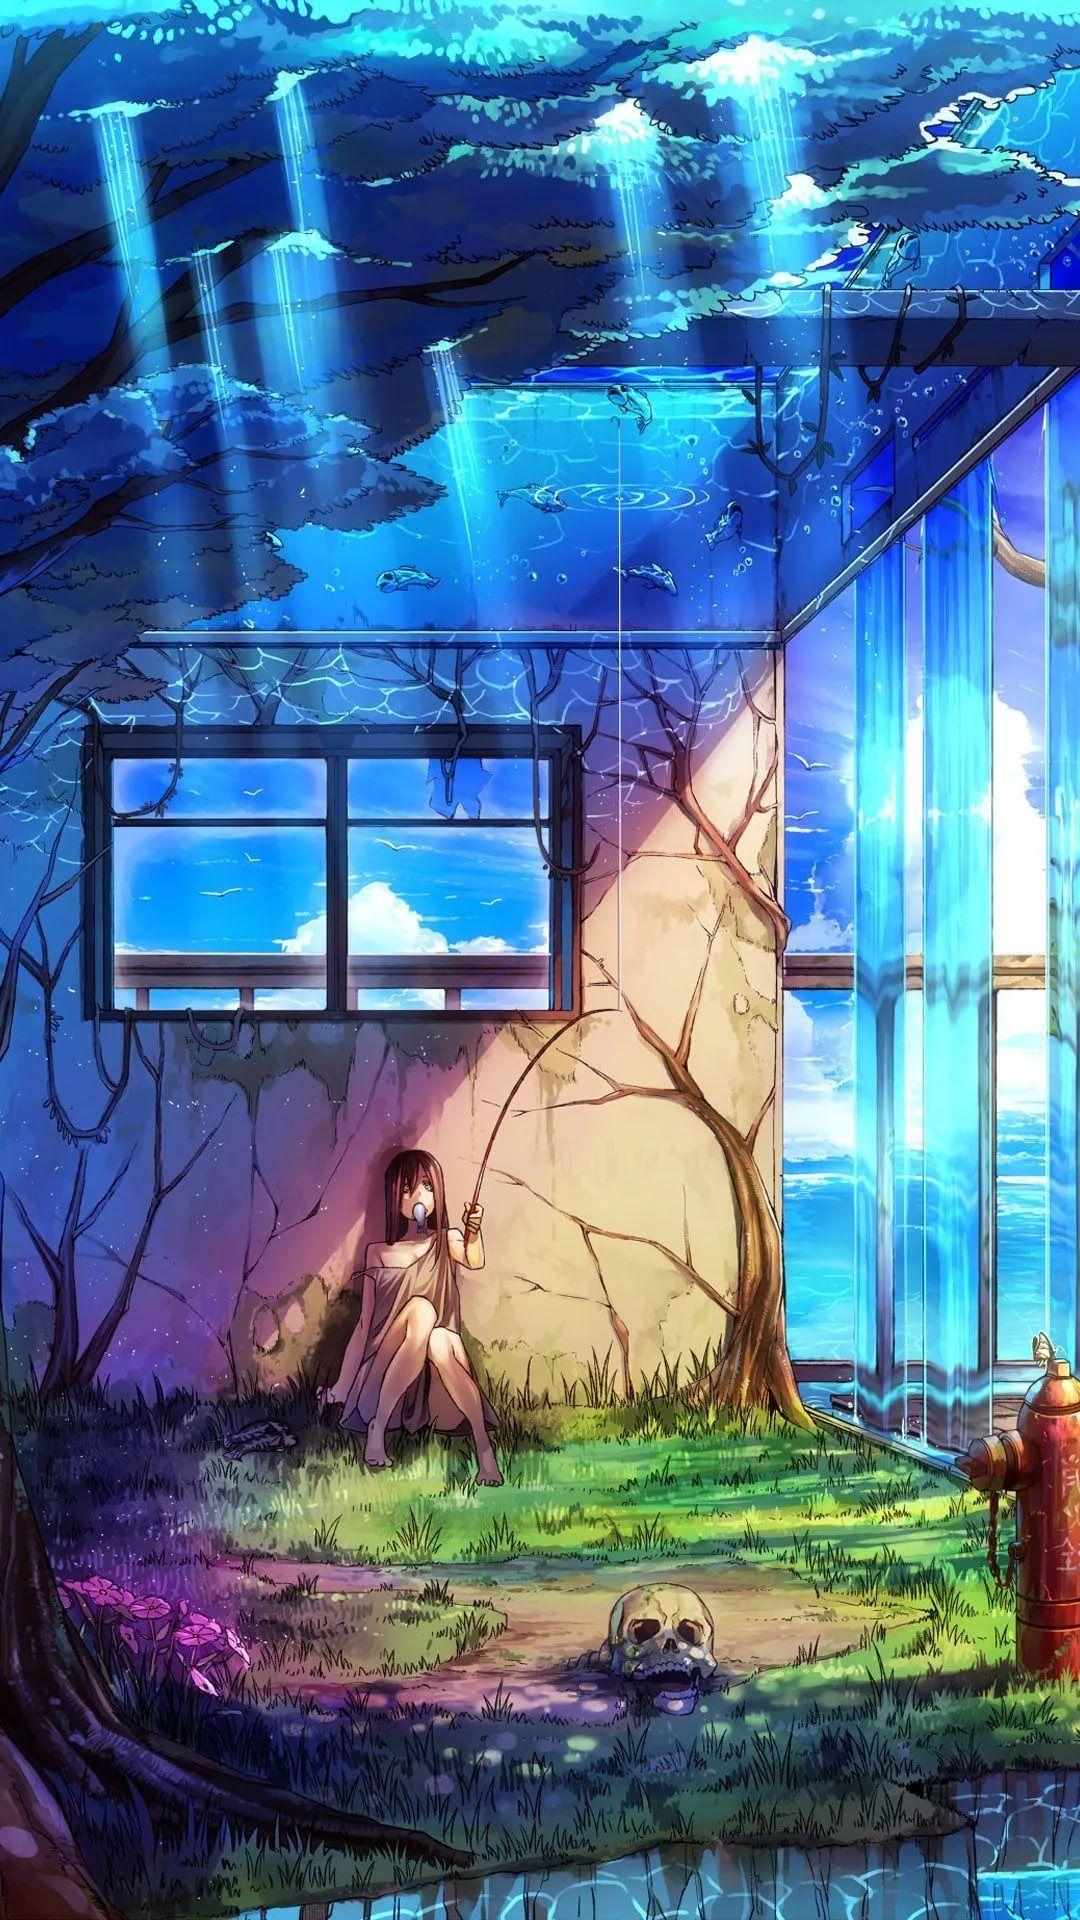 Sad Anime cool phone wallpaper